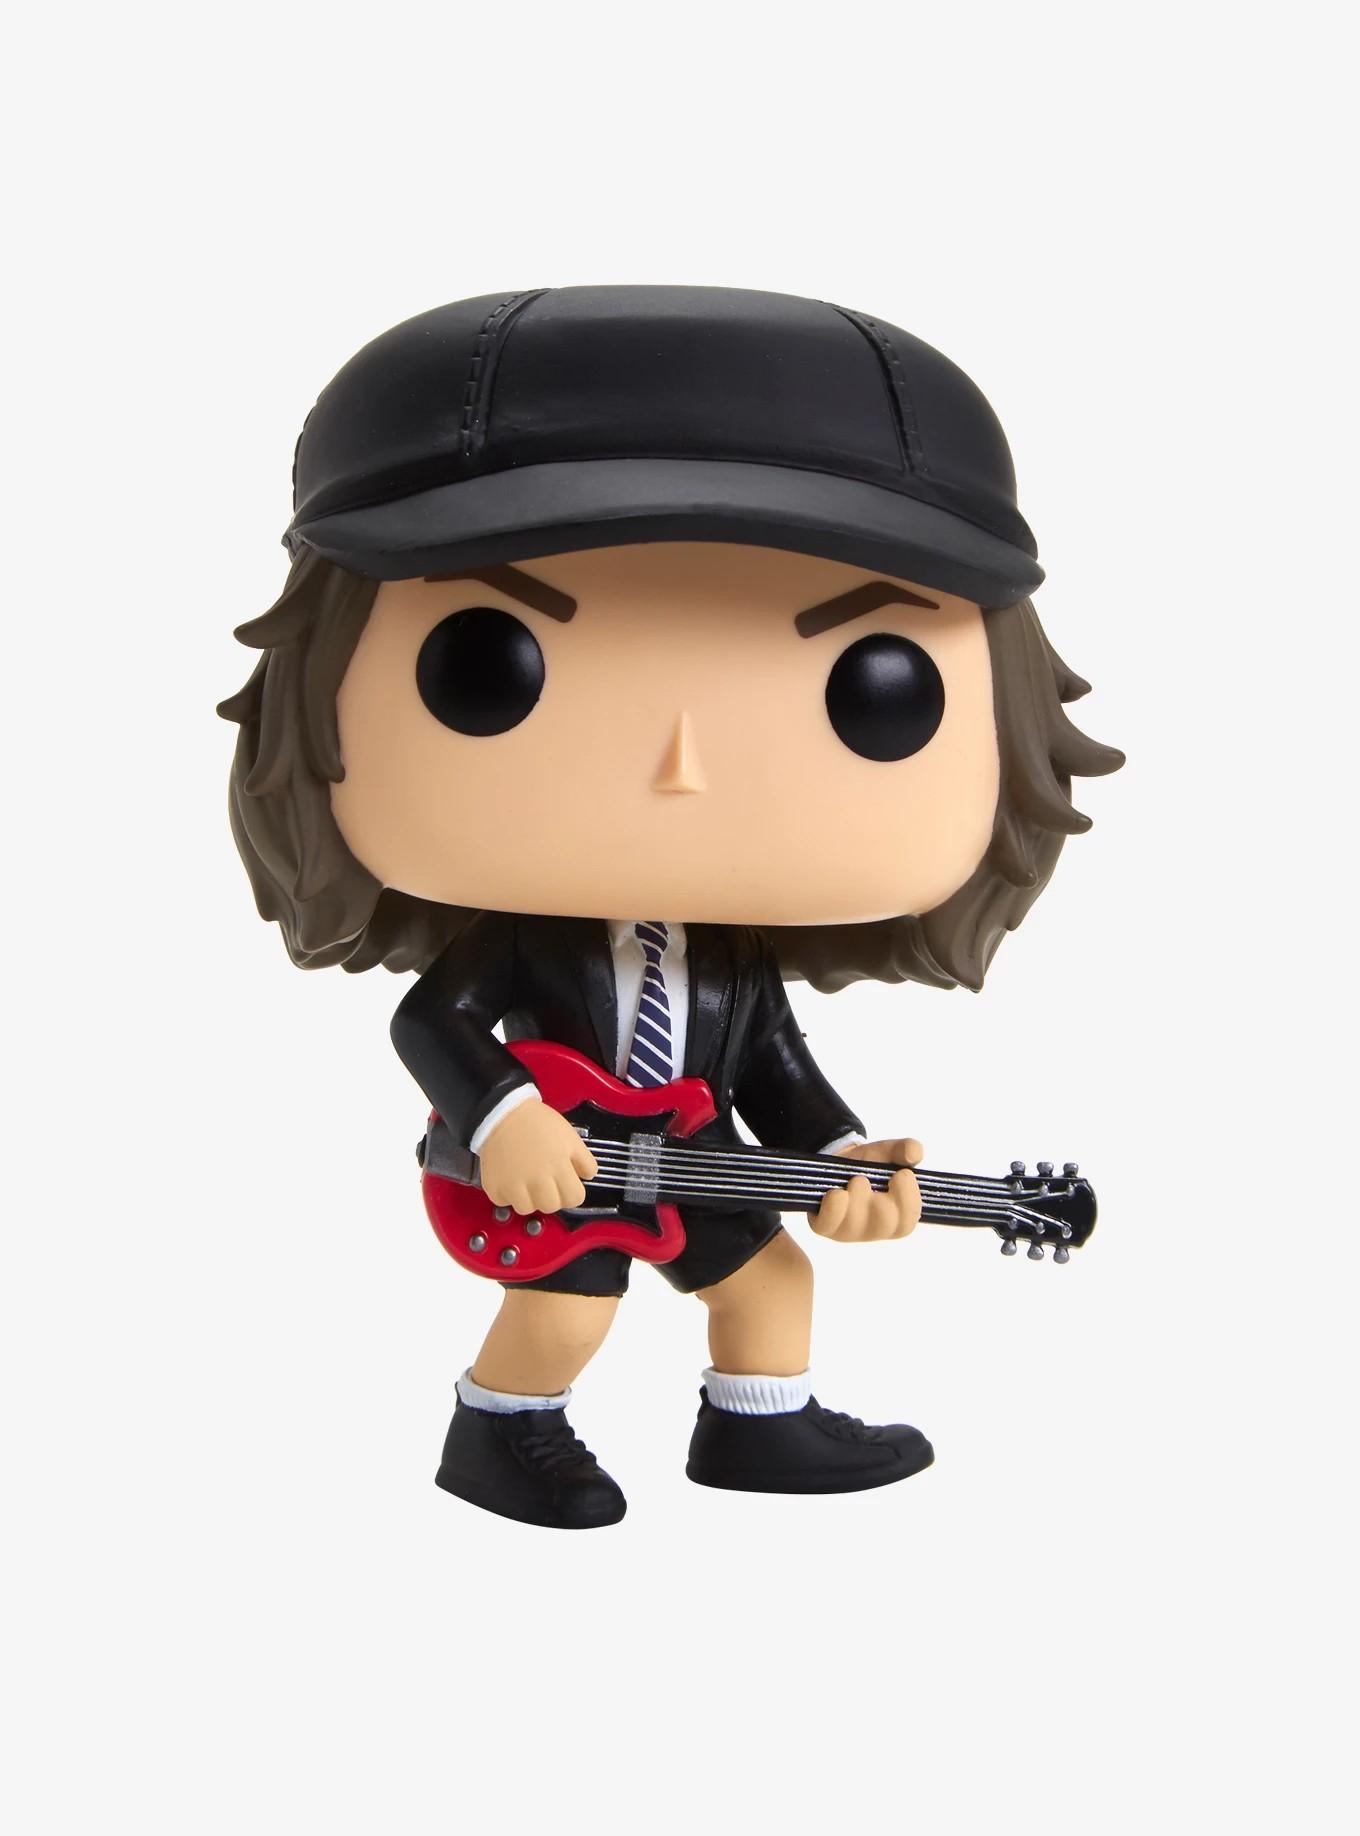 Angus Young #91 - AC/DC - Funko Pop! Rocks